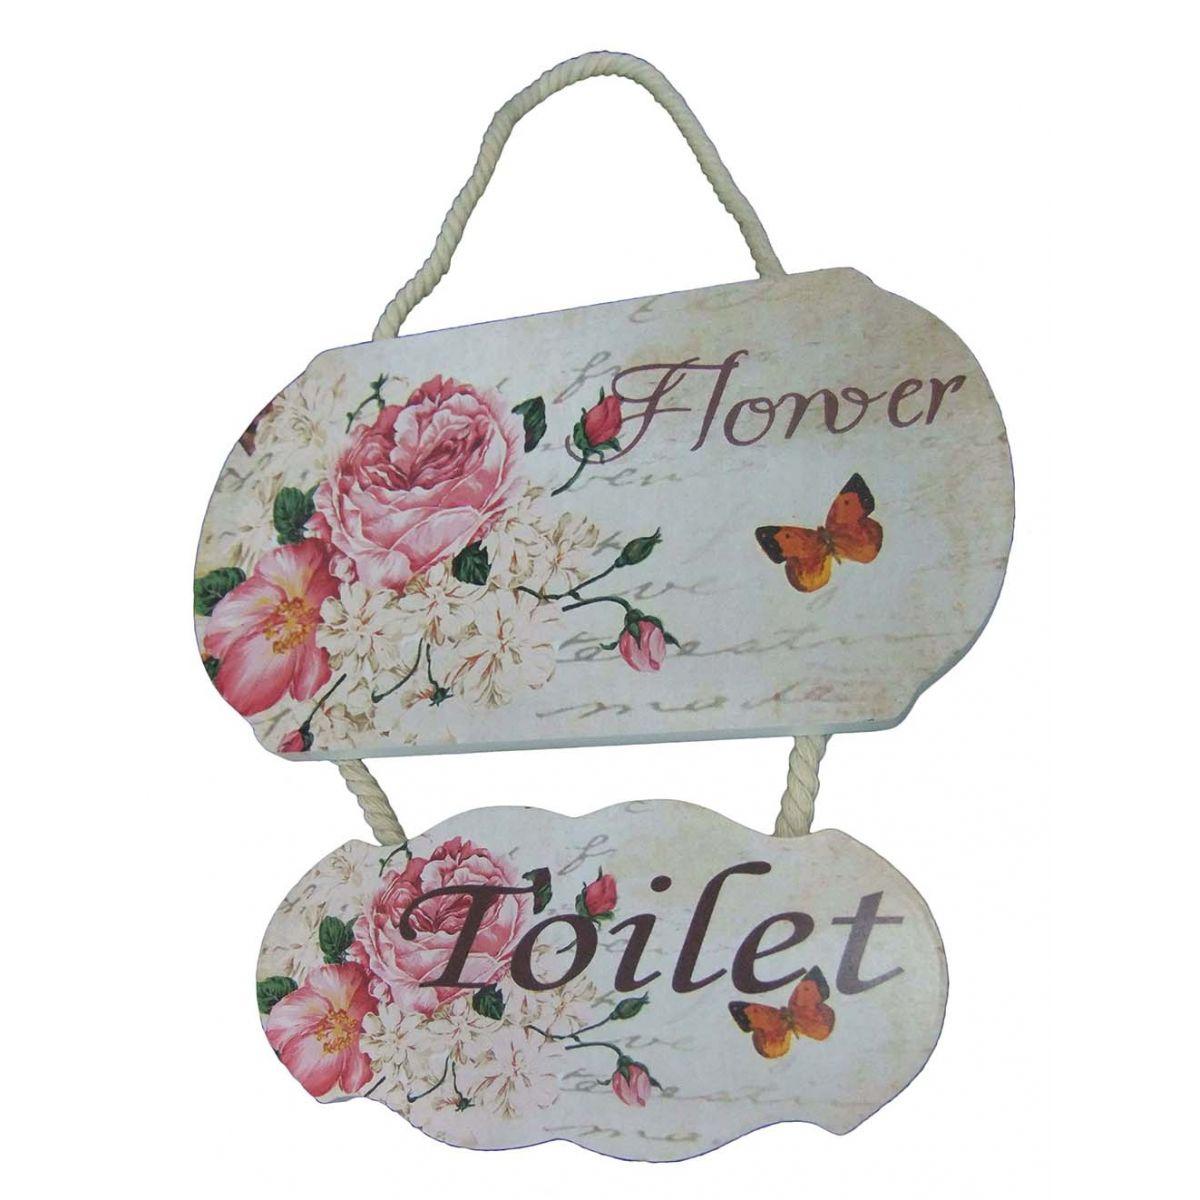 Placa Sanitario Banheiro Indica Enfeite Toilete Madeira Mulher (MAD  #7F4242 1200 1200